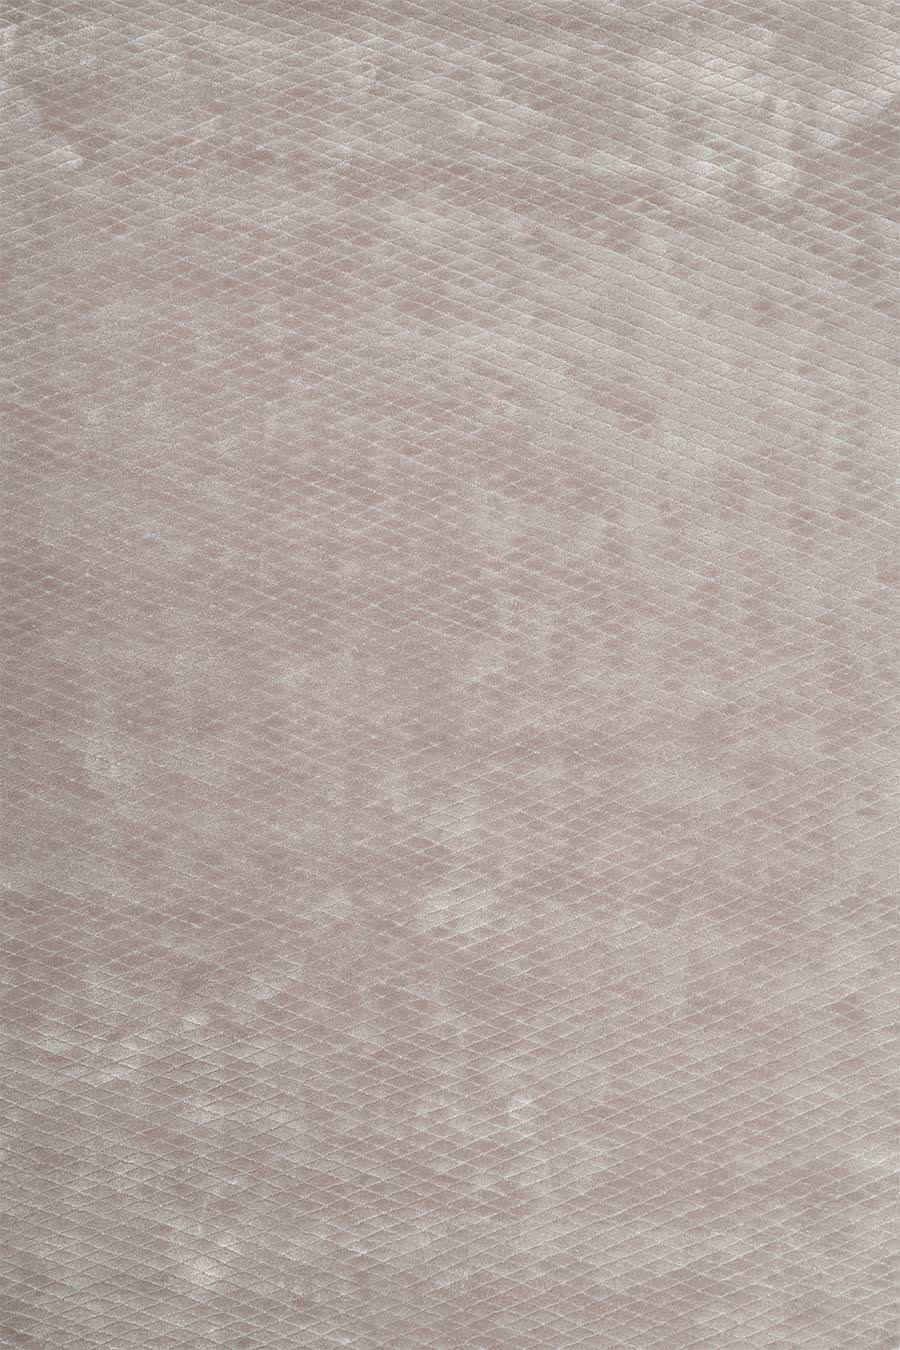 Overhead view of textured Diamond Velour rug in light beige colour